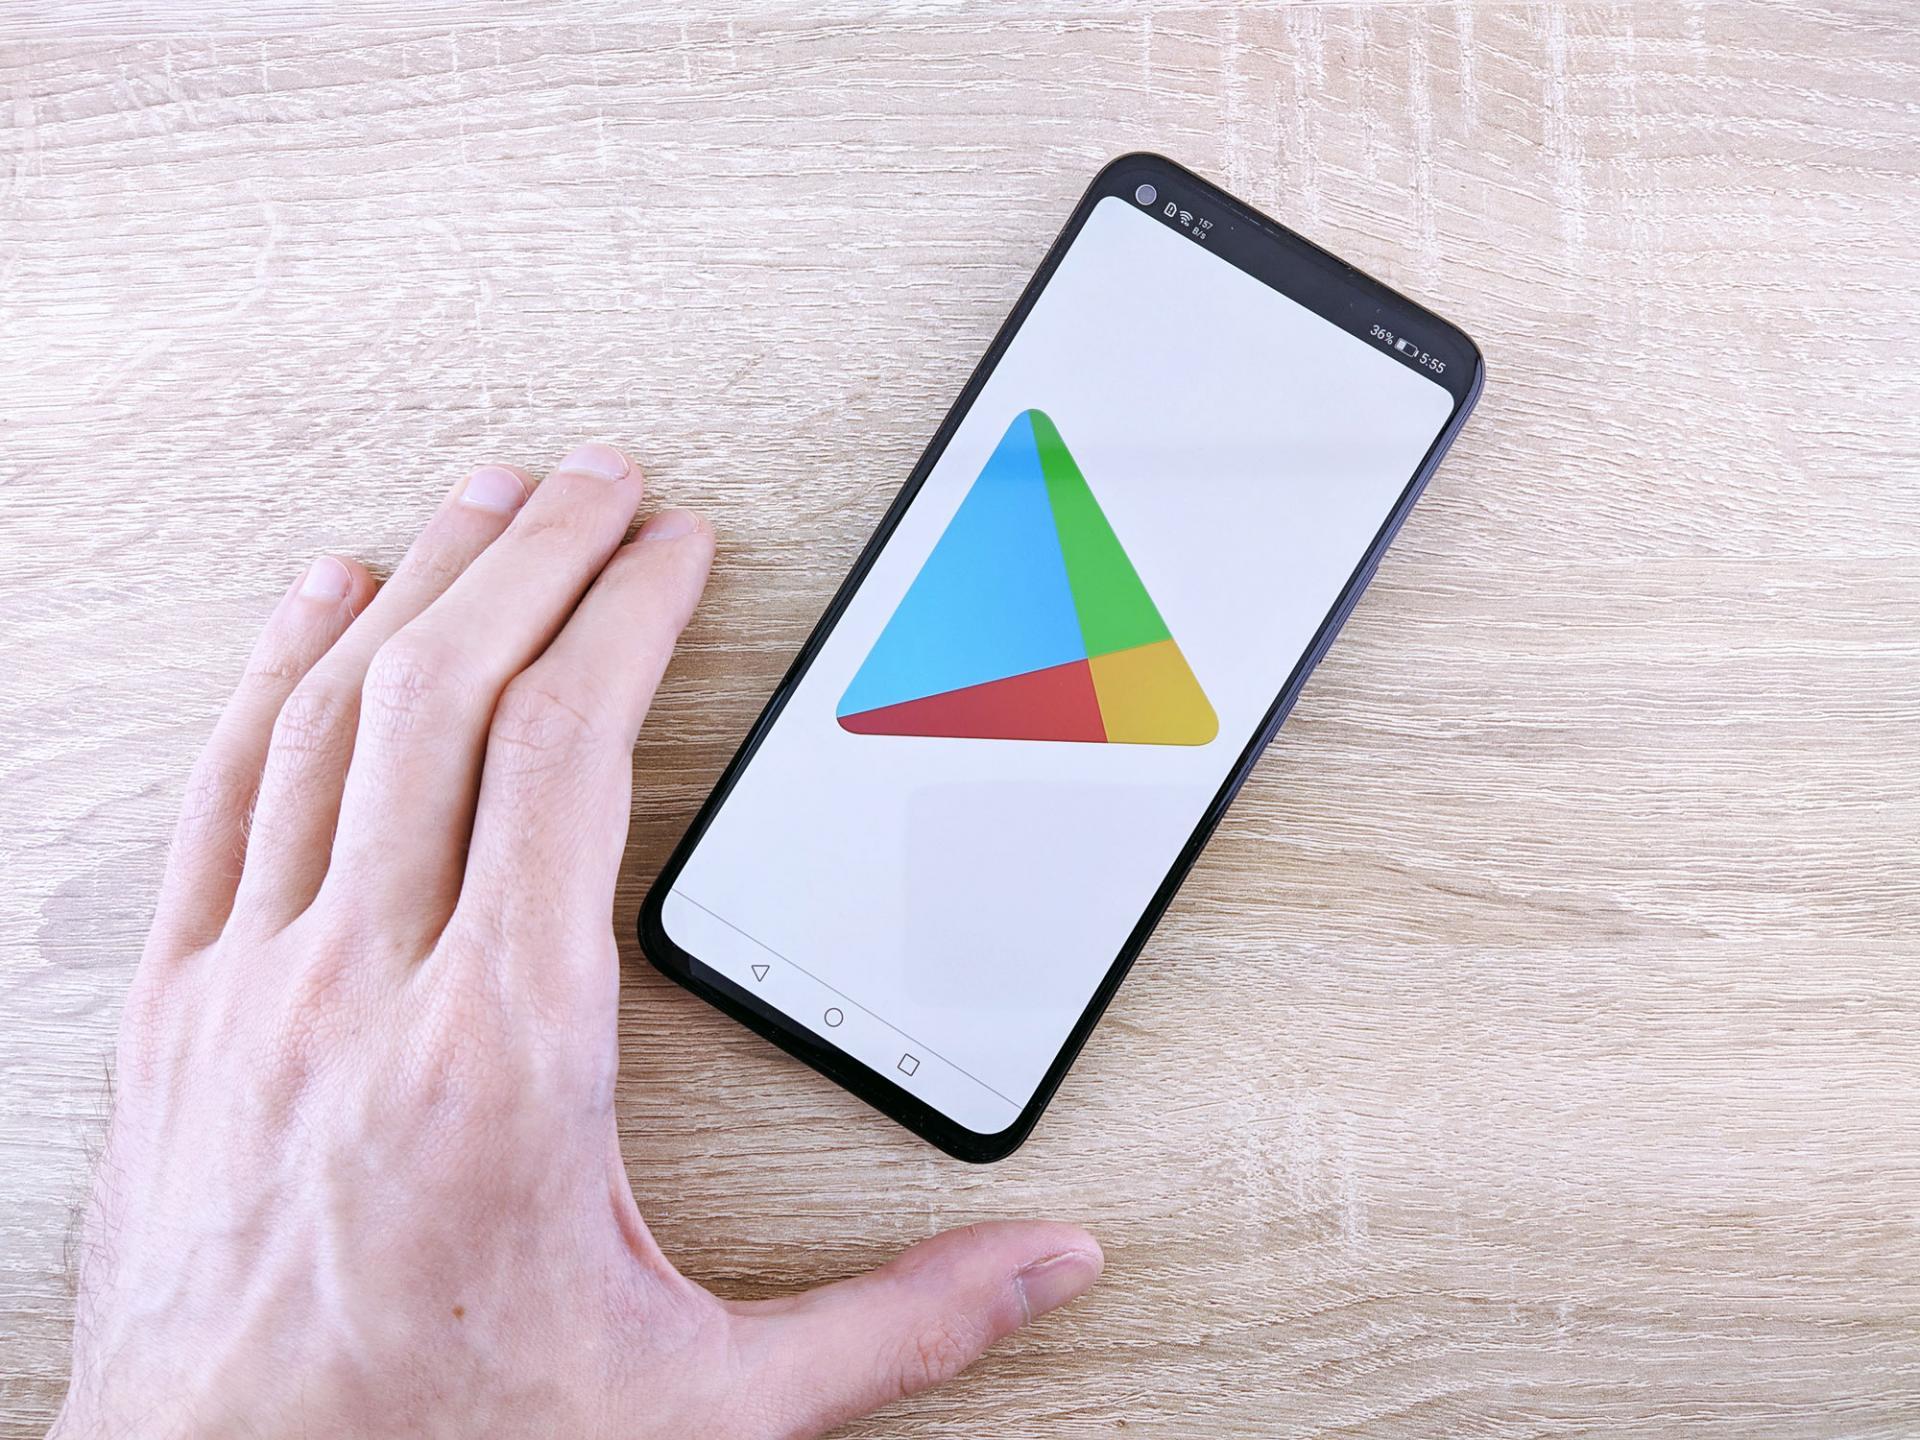 Google Play Store обновился сразу 2 раза. Свежая версия 23.9.24